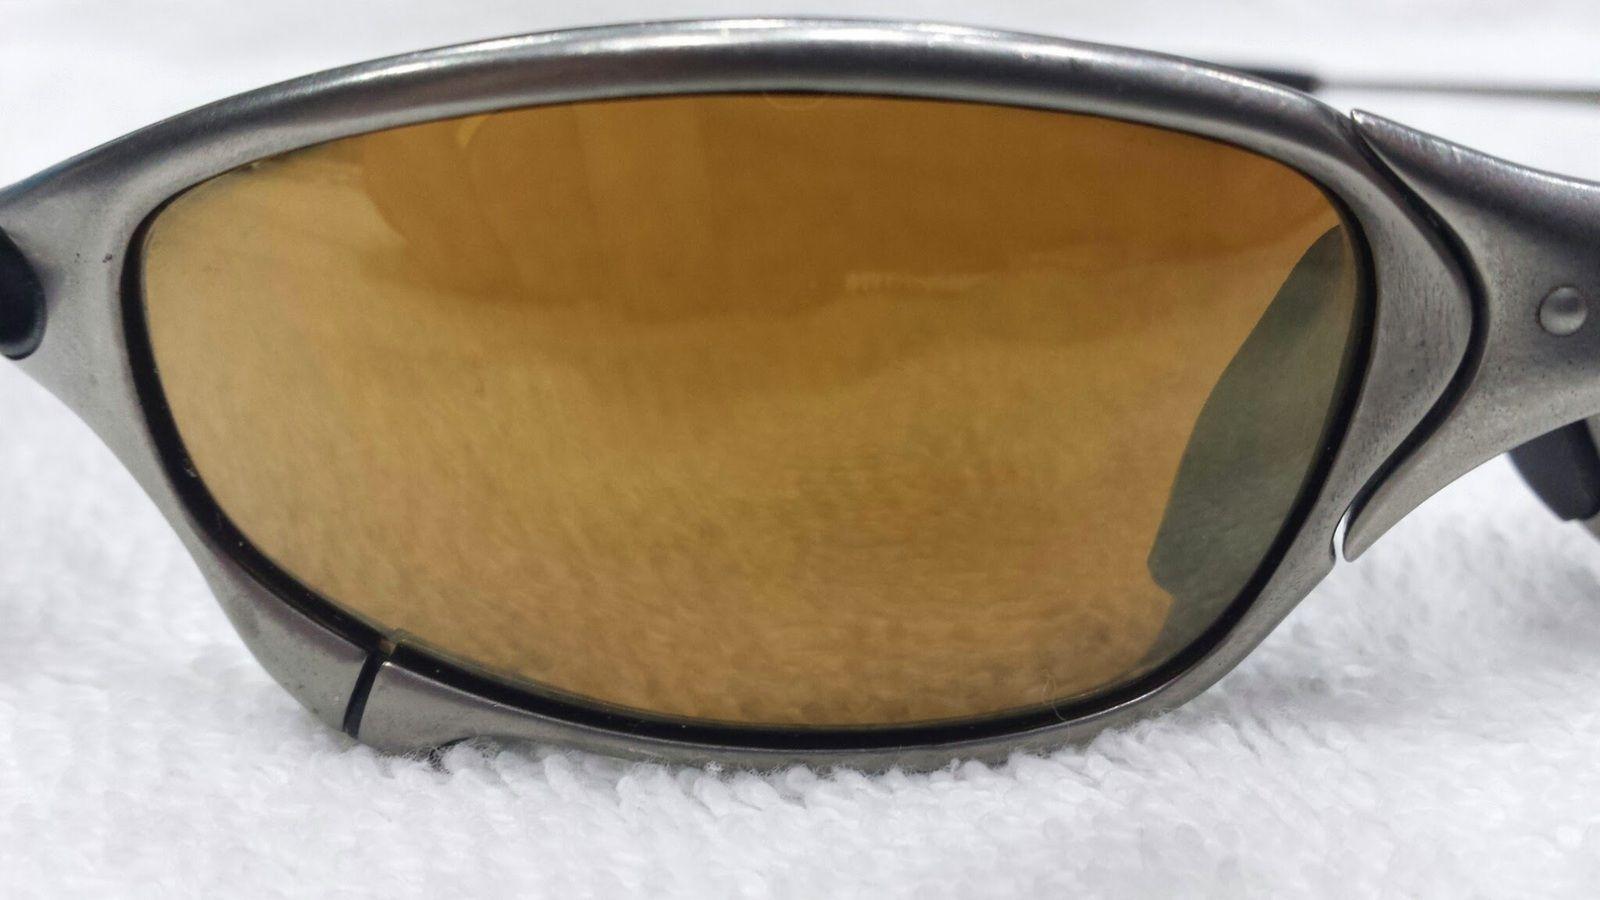 Juliet Titanium Serialized T######A - $240 Shipped - 20140320_194057.jpg